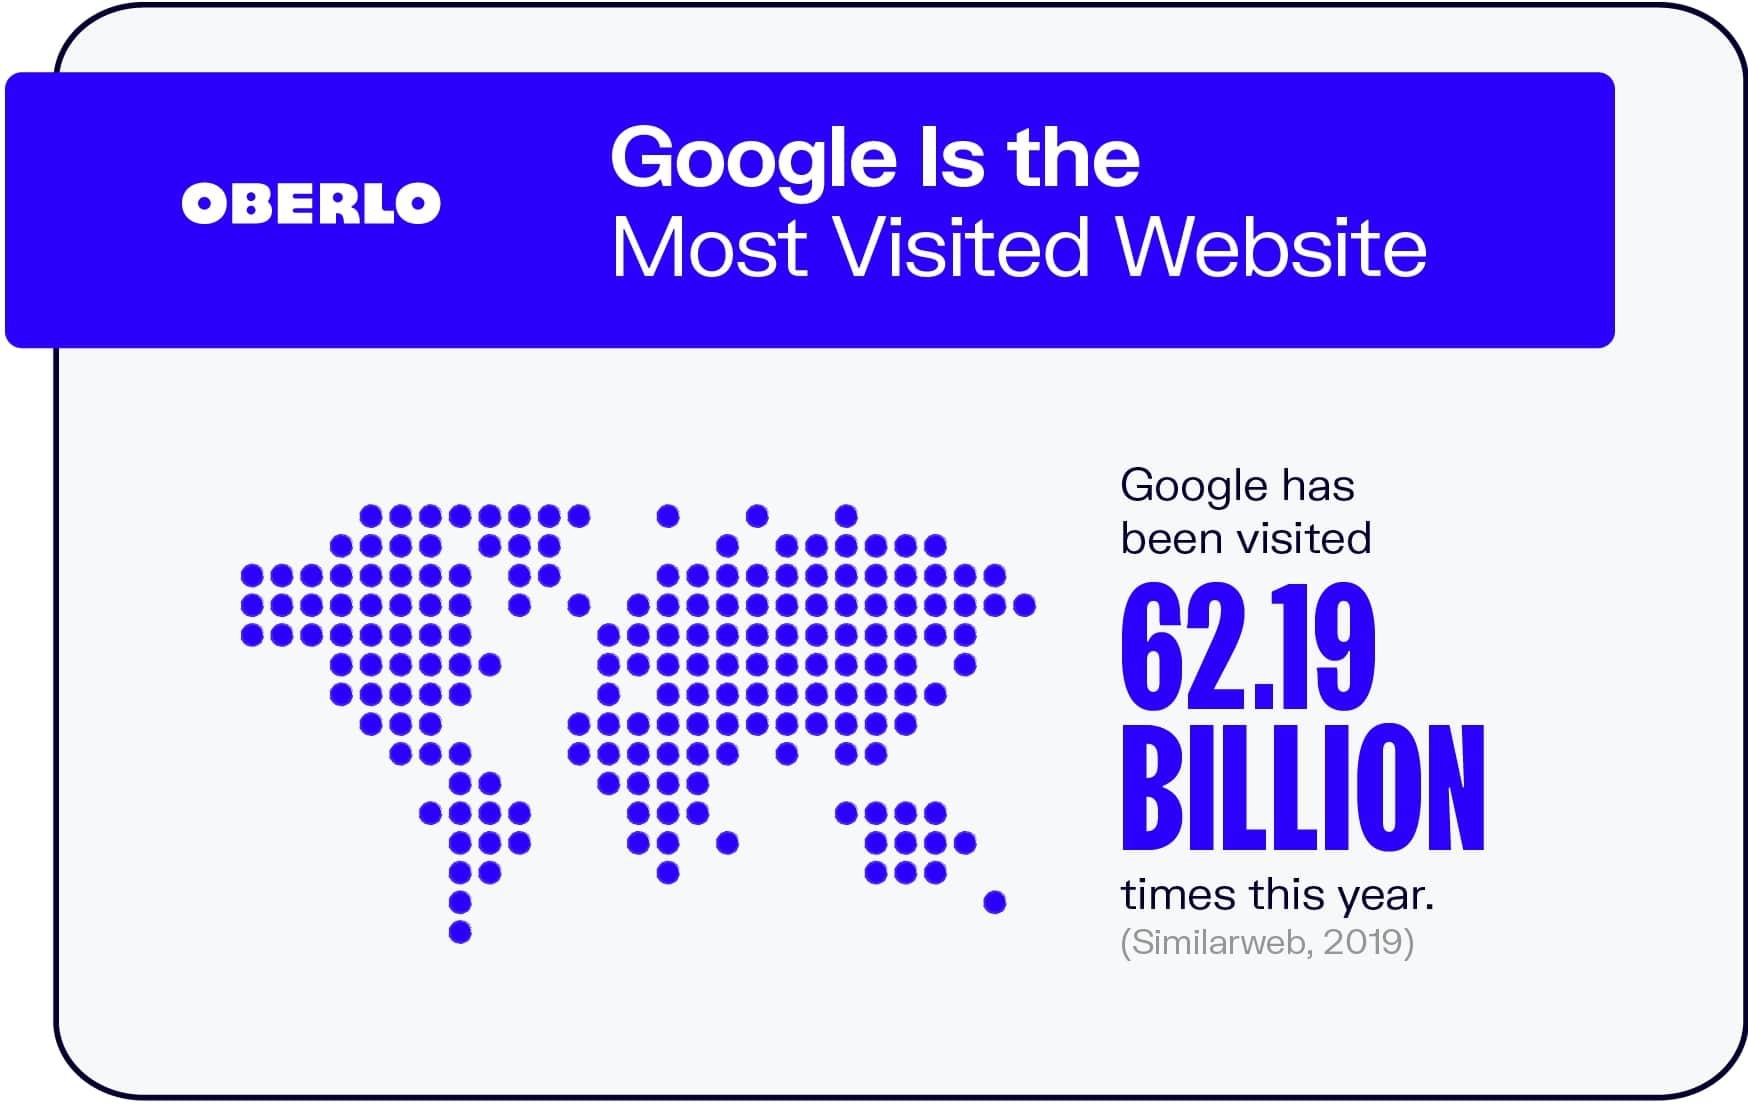 statystyki Google